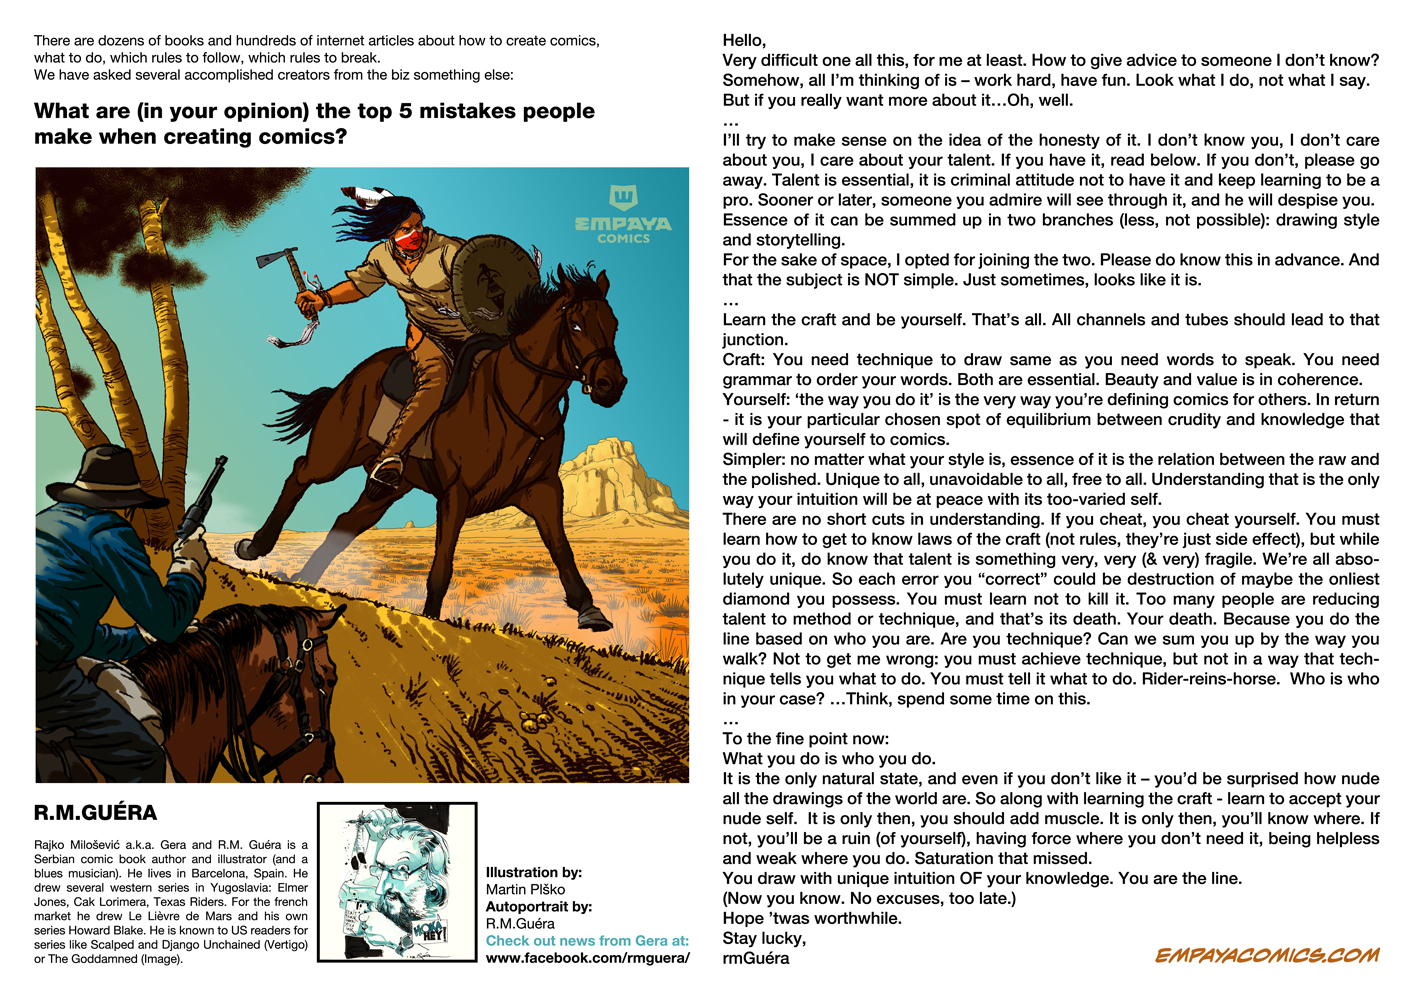 Top 5 mistakes when creating comics: R.M.Guera by EMPAYAcomics